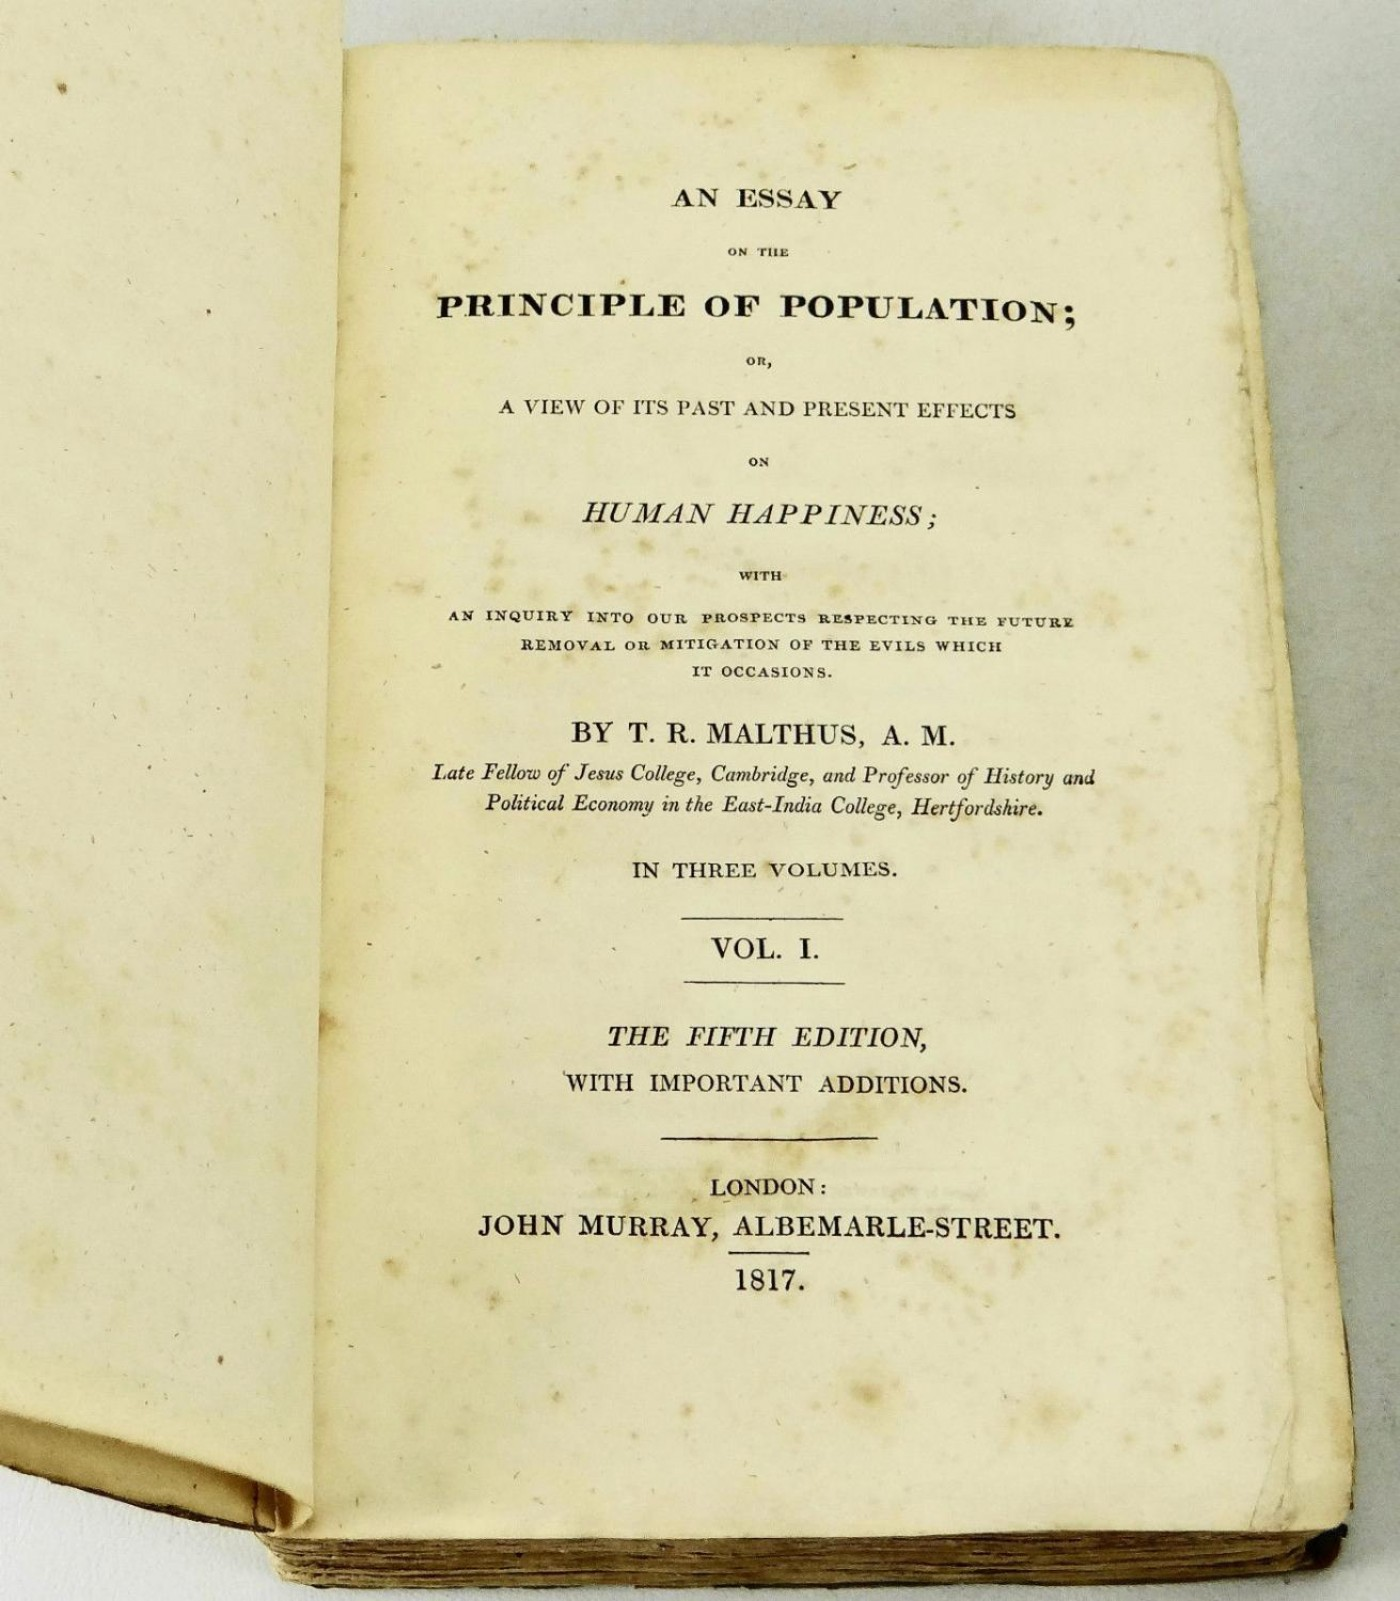 011 13726403944 5 Essay On The Principle Of Population Singular Malthus Sparknotes Thomas Main Idea 1400